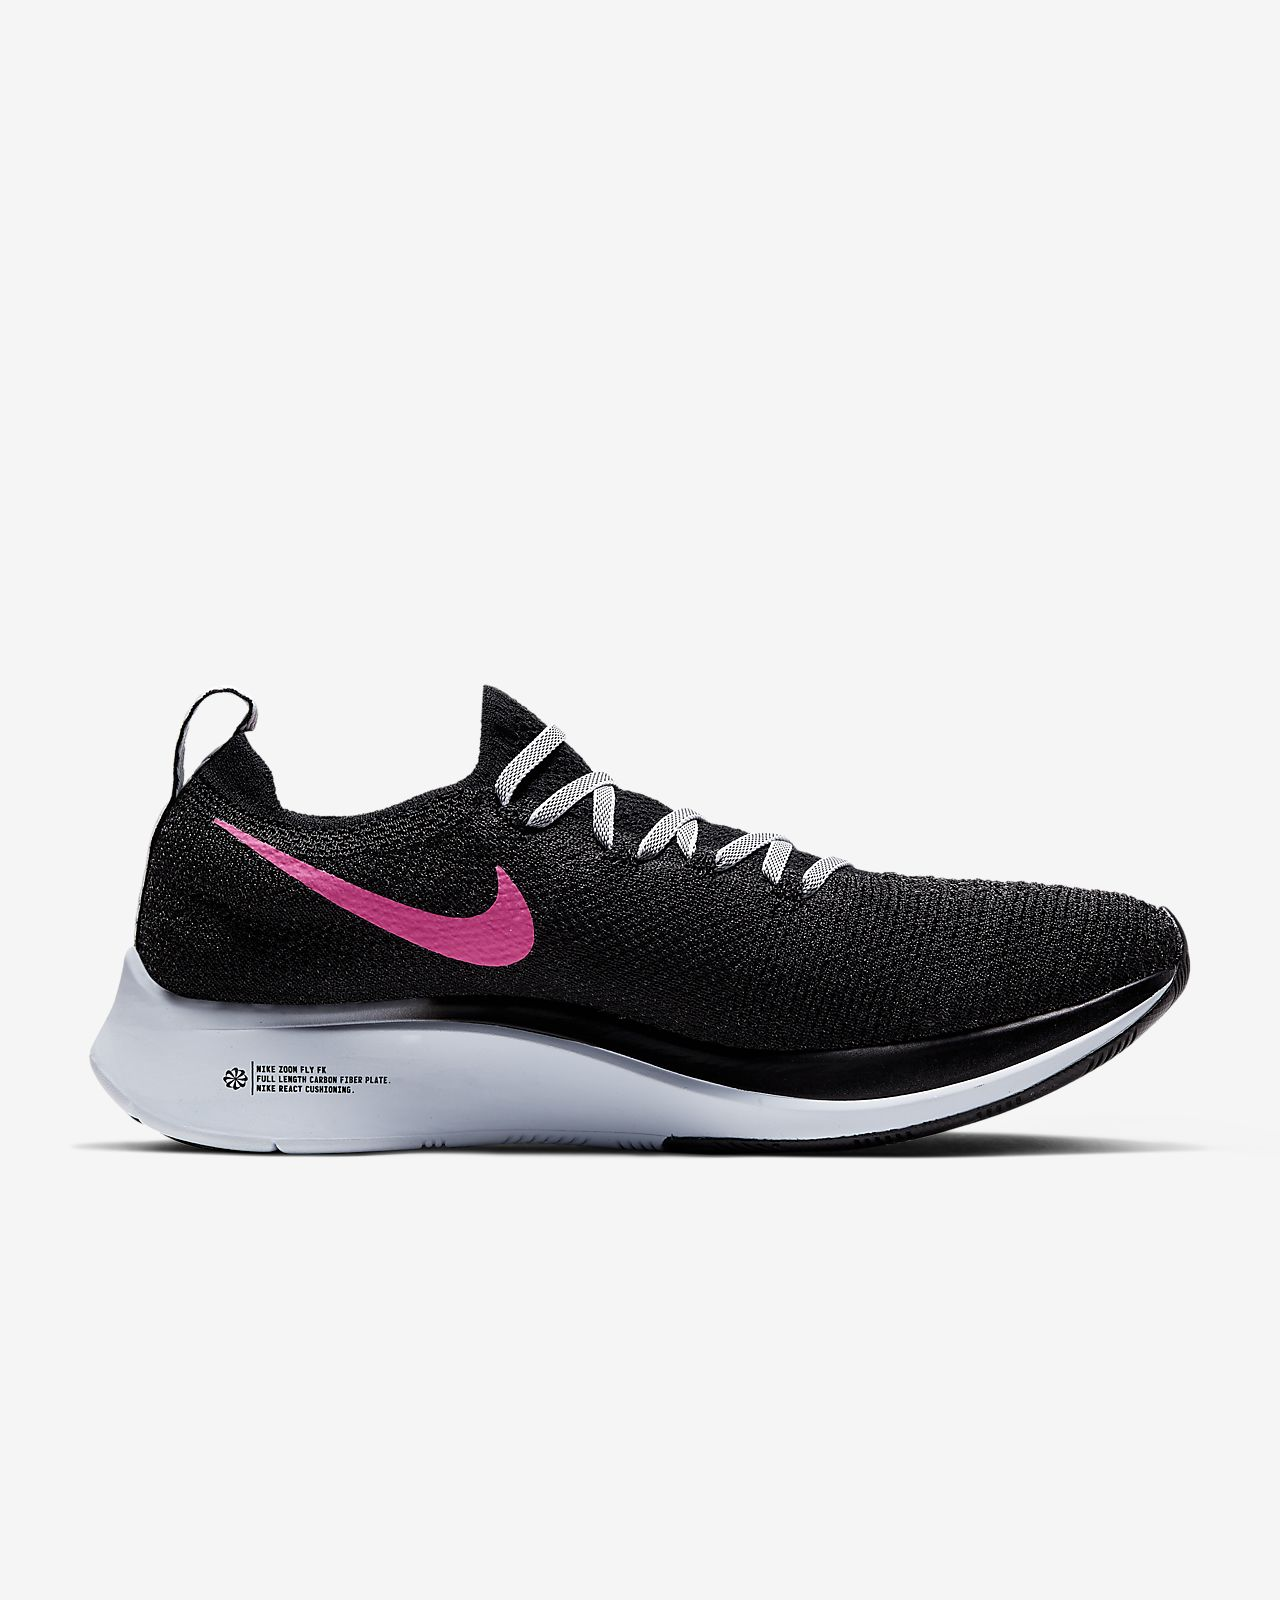 De Nike Flyknit Pour Zoom Running Fly Femme Chaussure uiPTlZOwkX